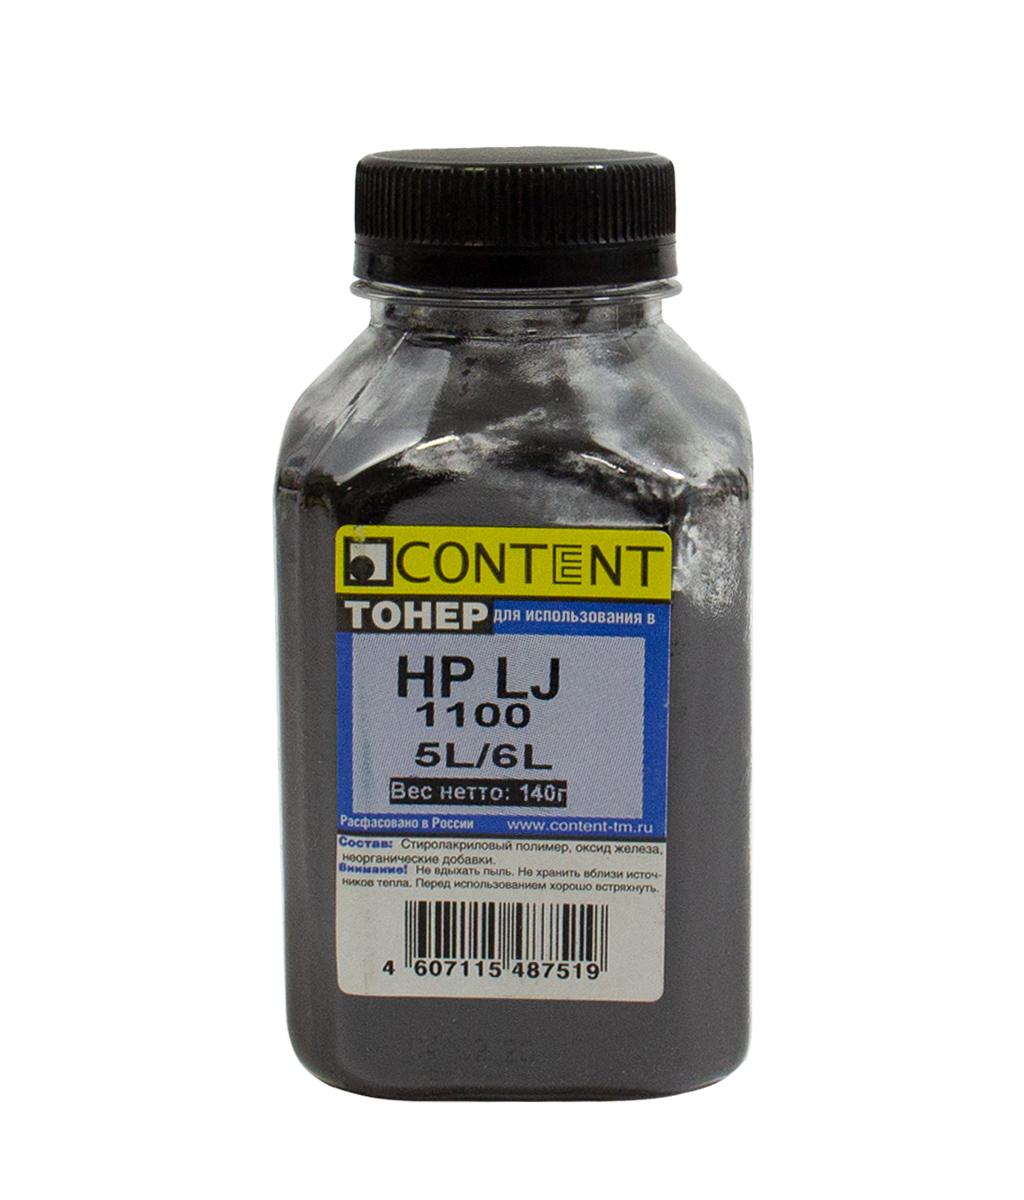 Тонер Content для HP LJ 1100/5L/6L, Bk, 140 г, банка